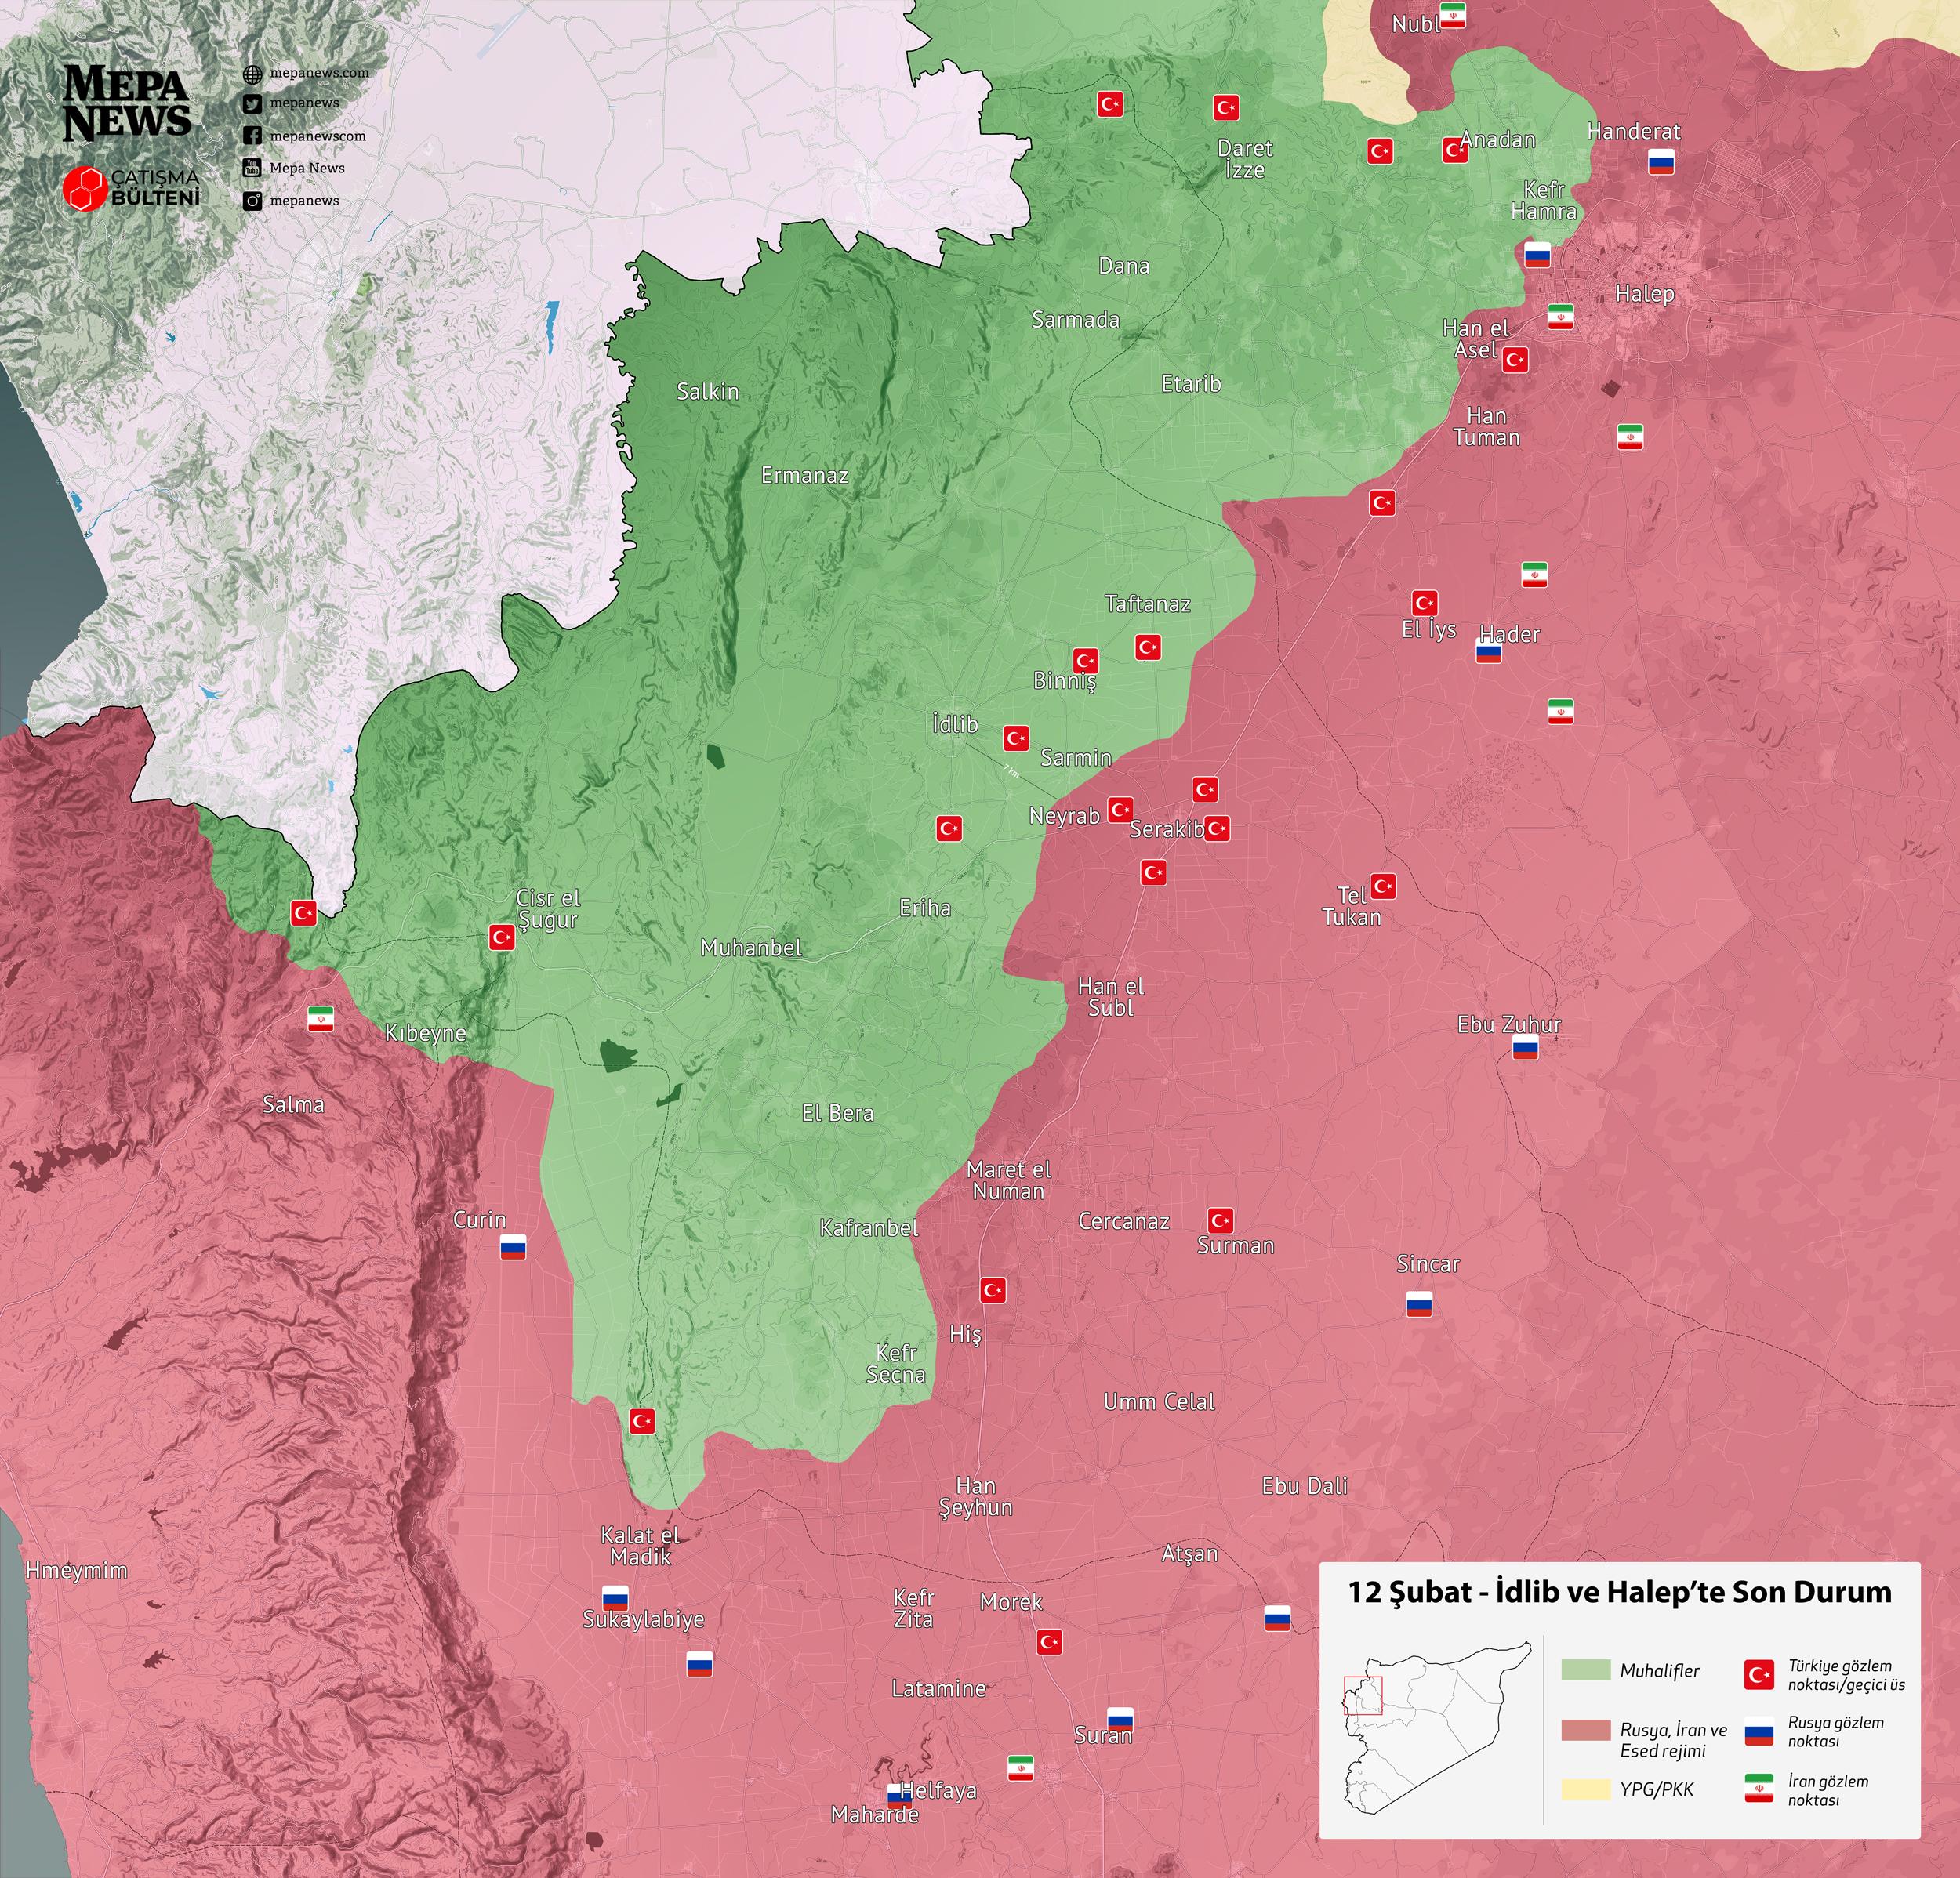 İdlib'de son durum (12 Şubat 2020)